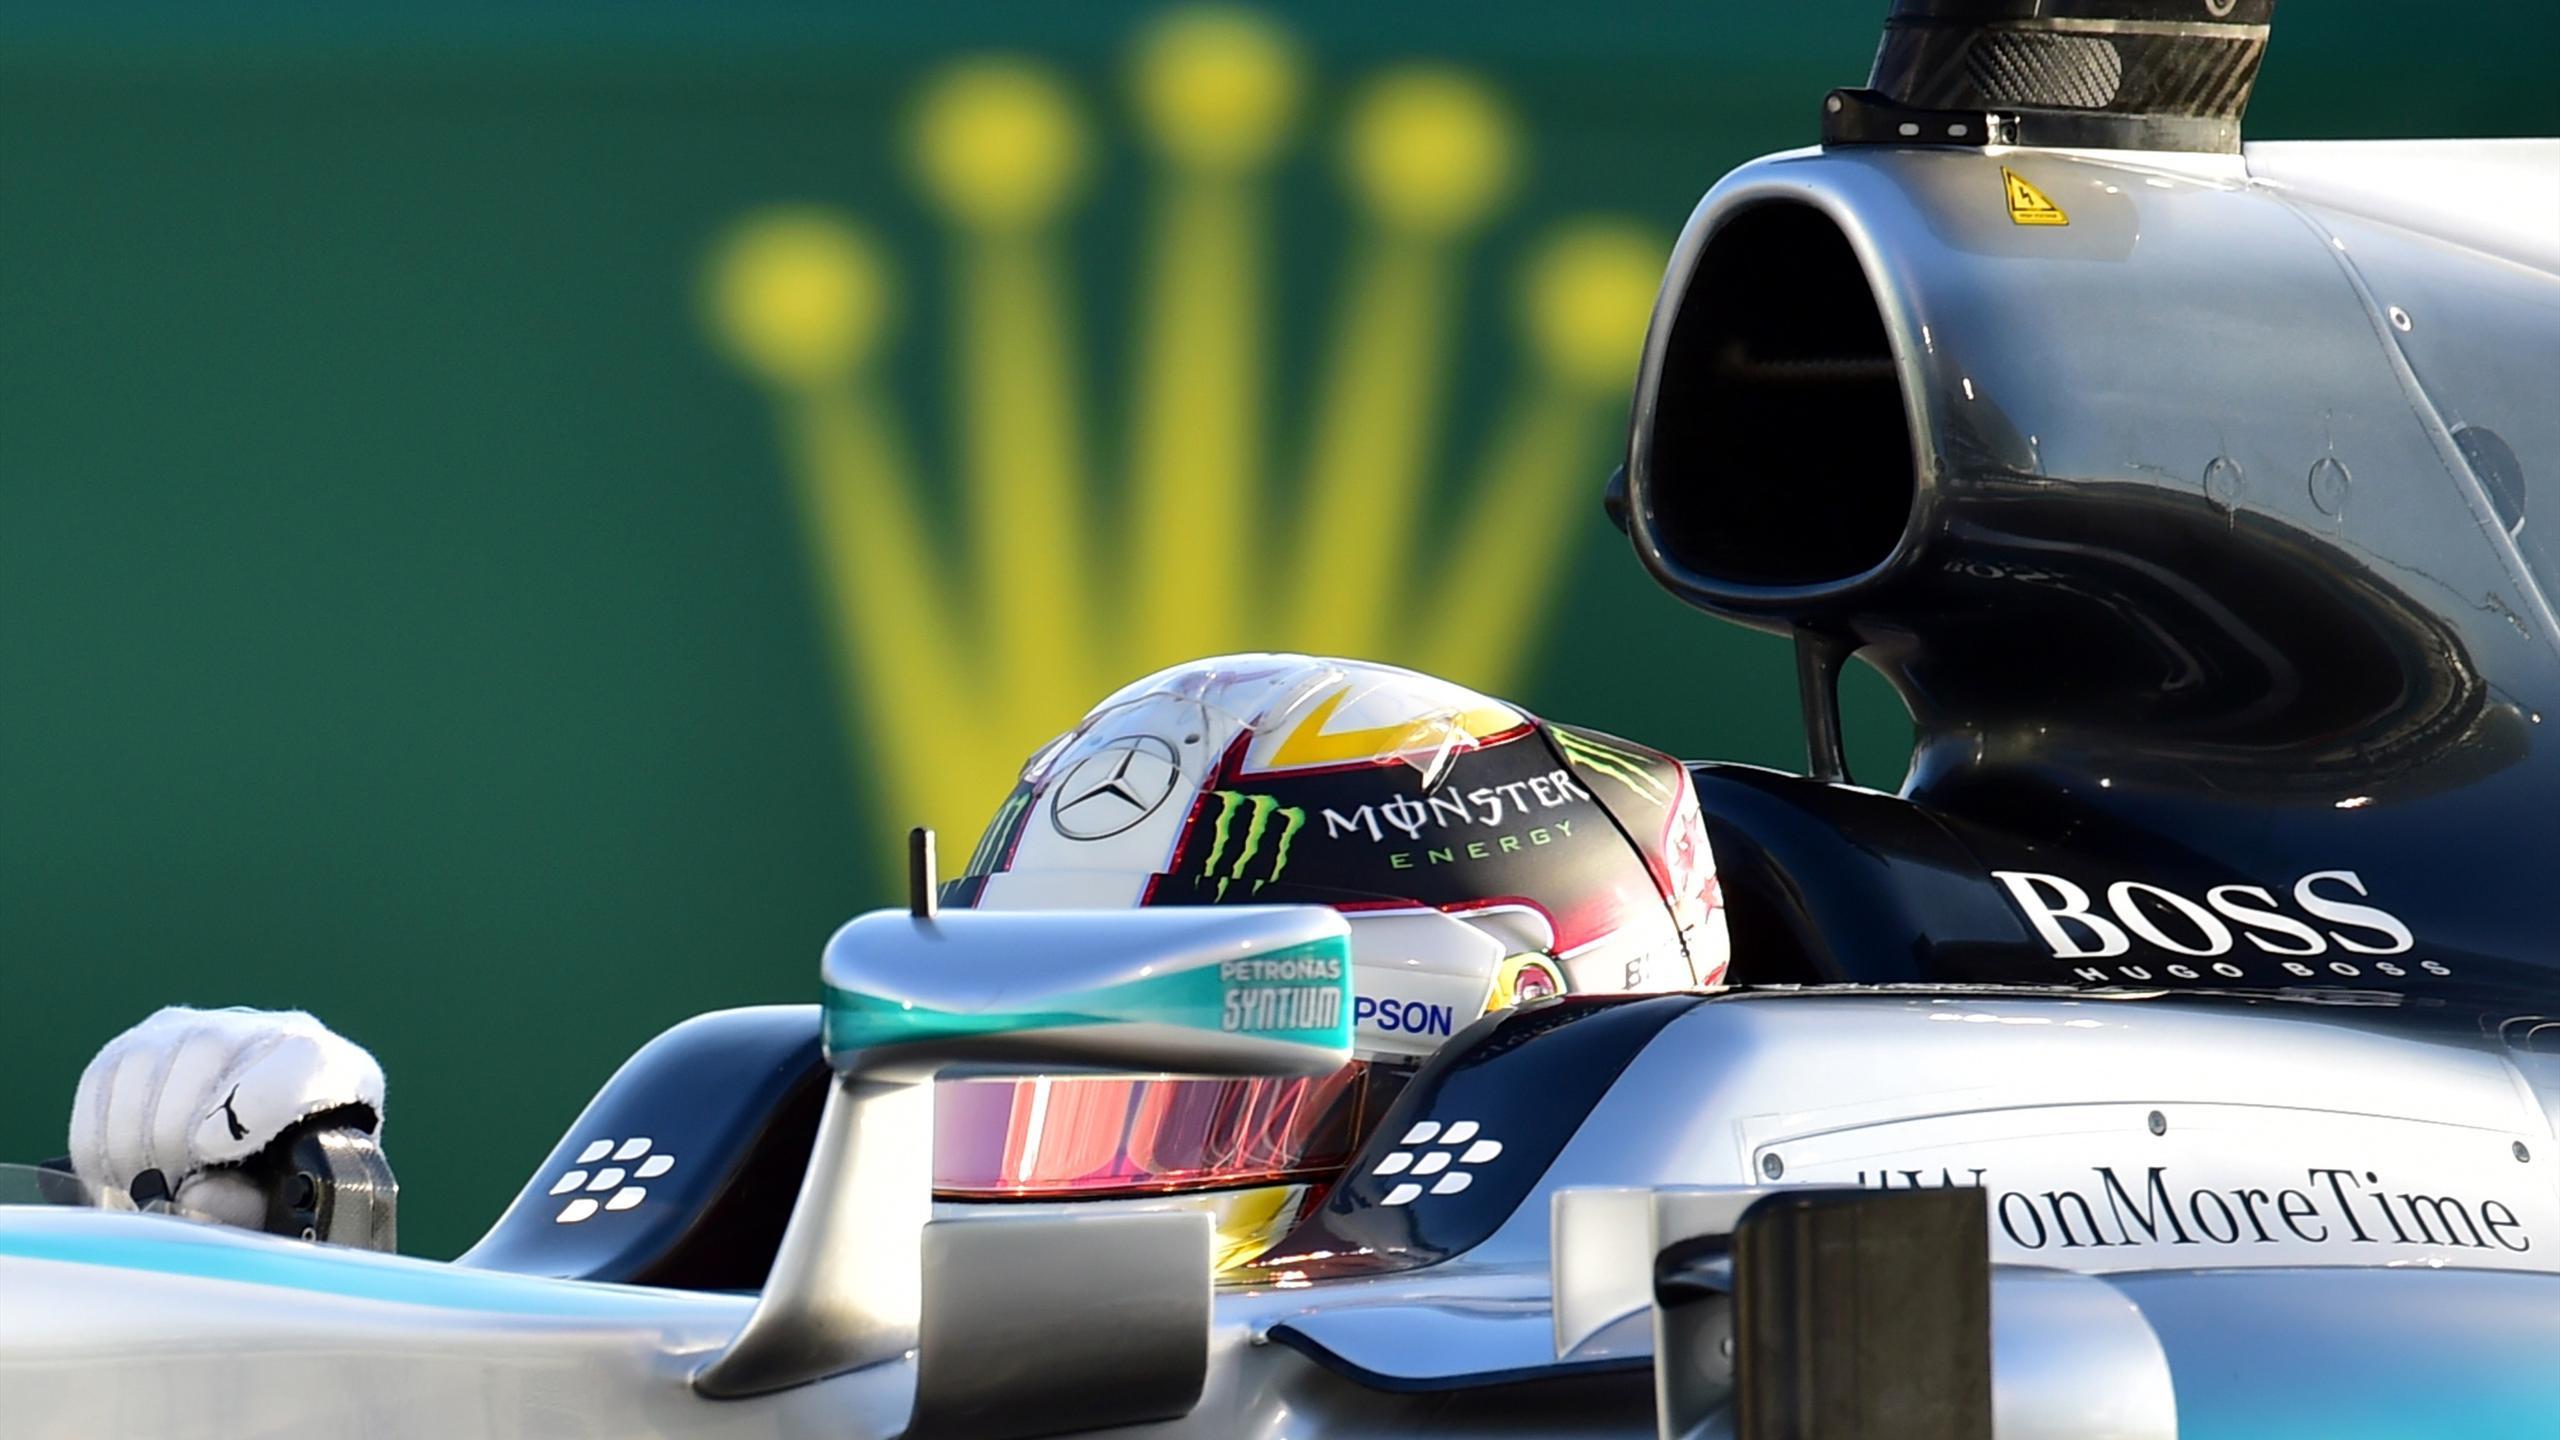 Mercedes AMG Petronas F1 Team's British driver Lewis Hamilton races during the Abu Dhabi Formula One Grand Prix at the Yas Marina circuit on November 29, 2015.